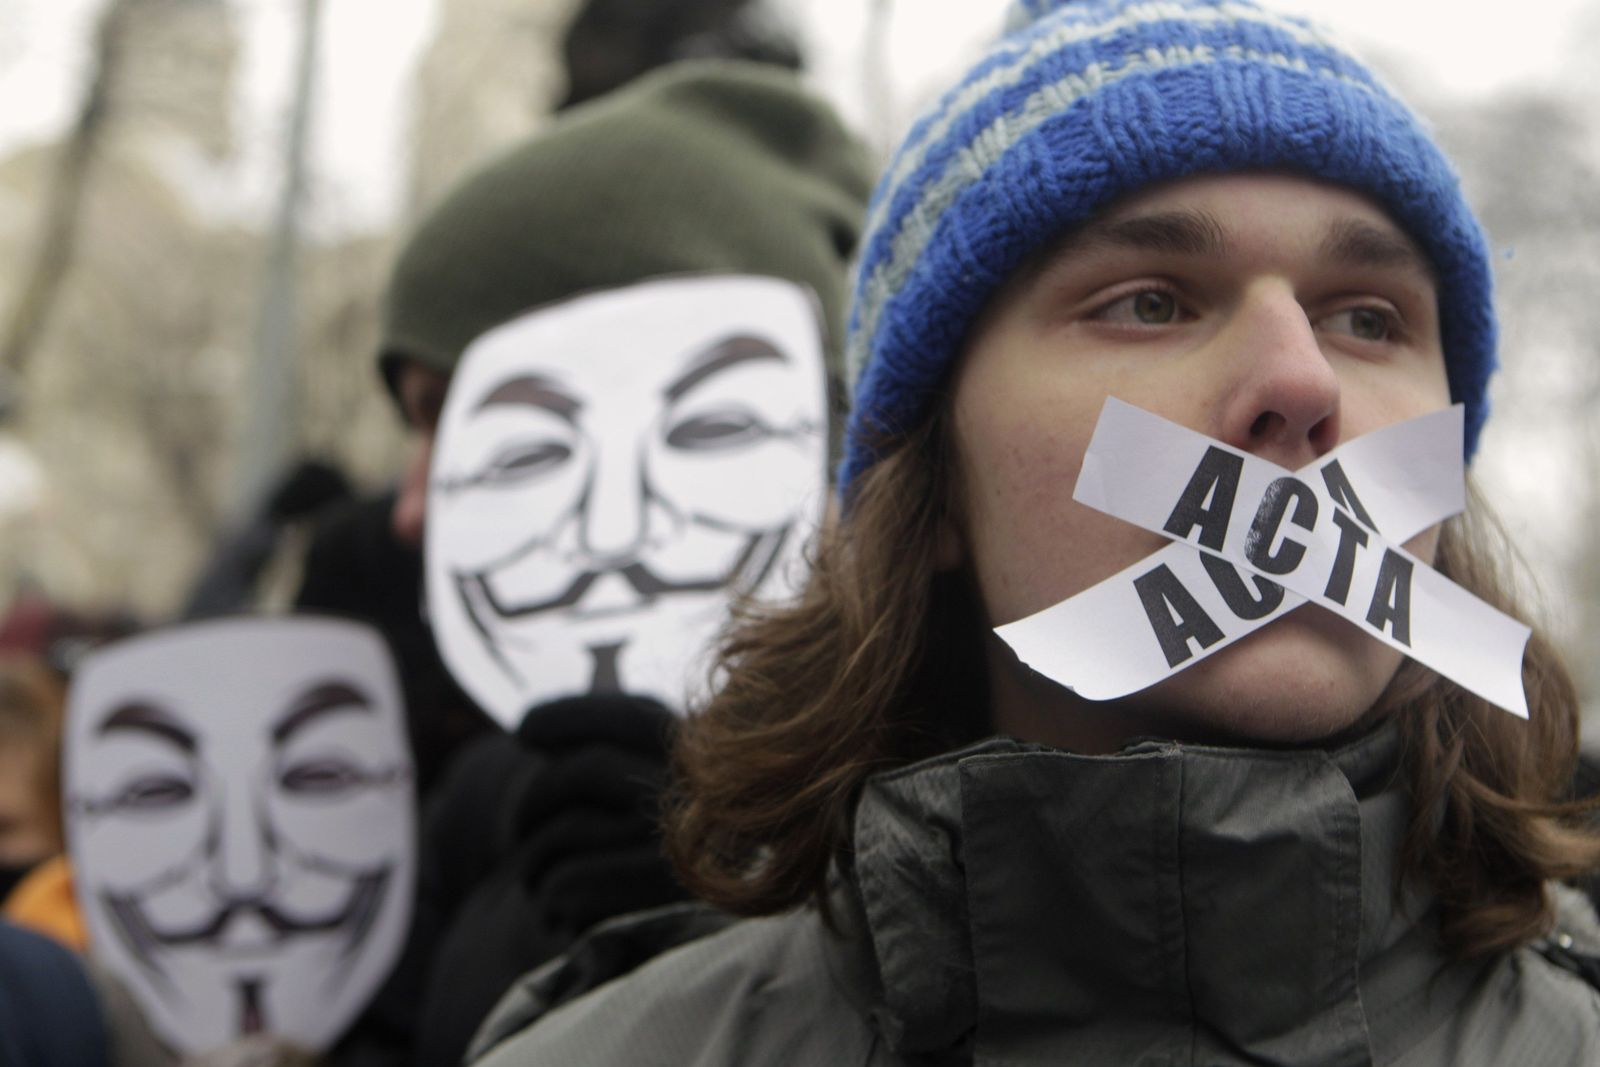 LATVIA-PROTEST/ACTA